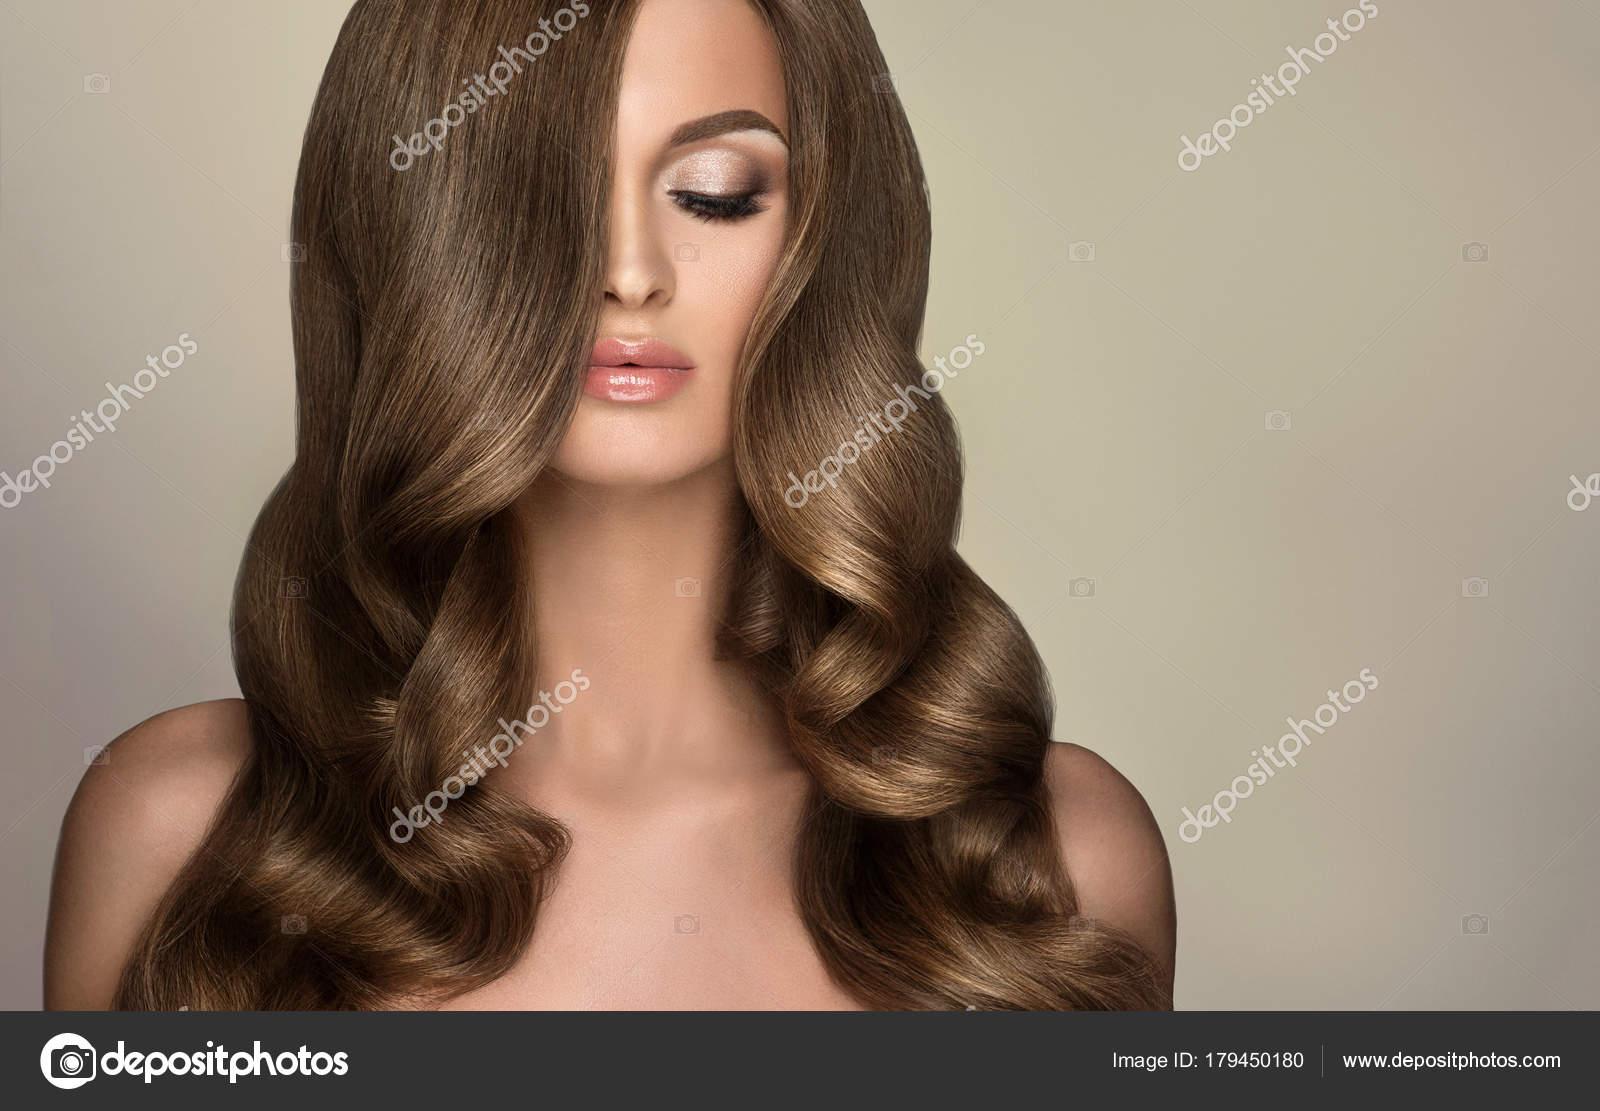 Chica Morena Con Pelo Rizado Largo Brillante Mujer Hermosa Modelo